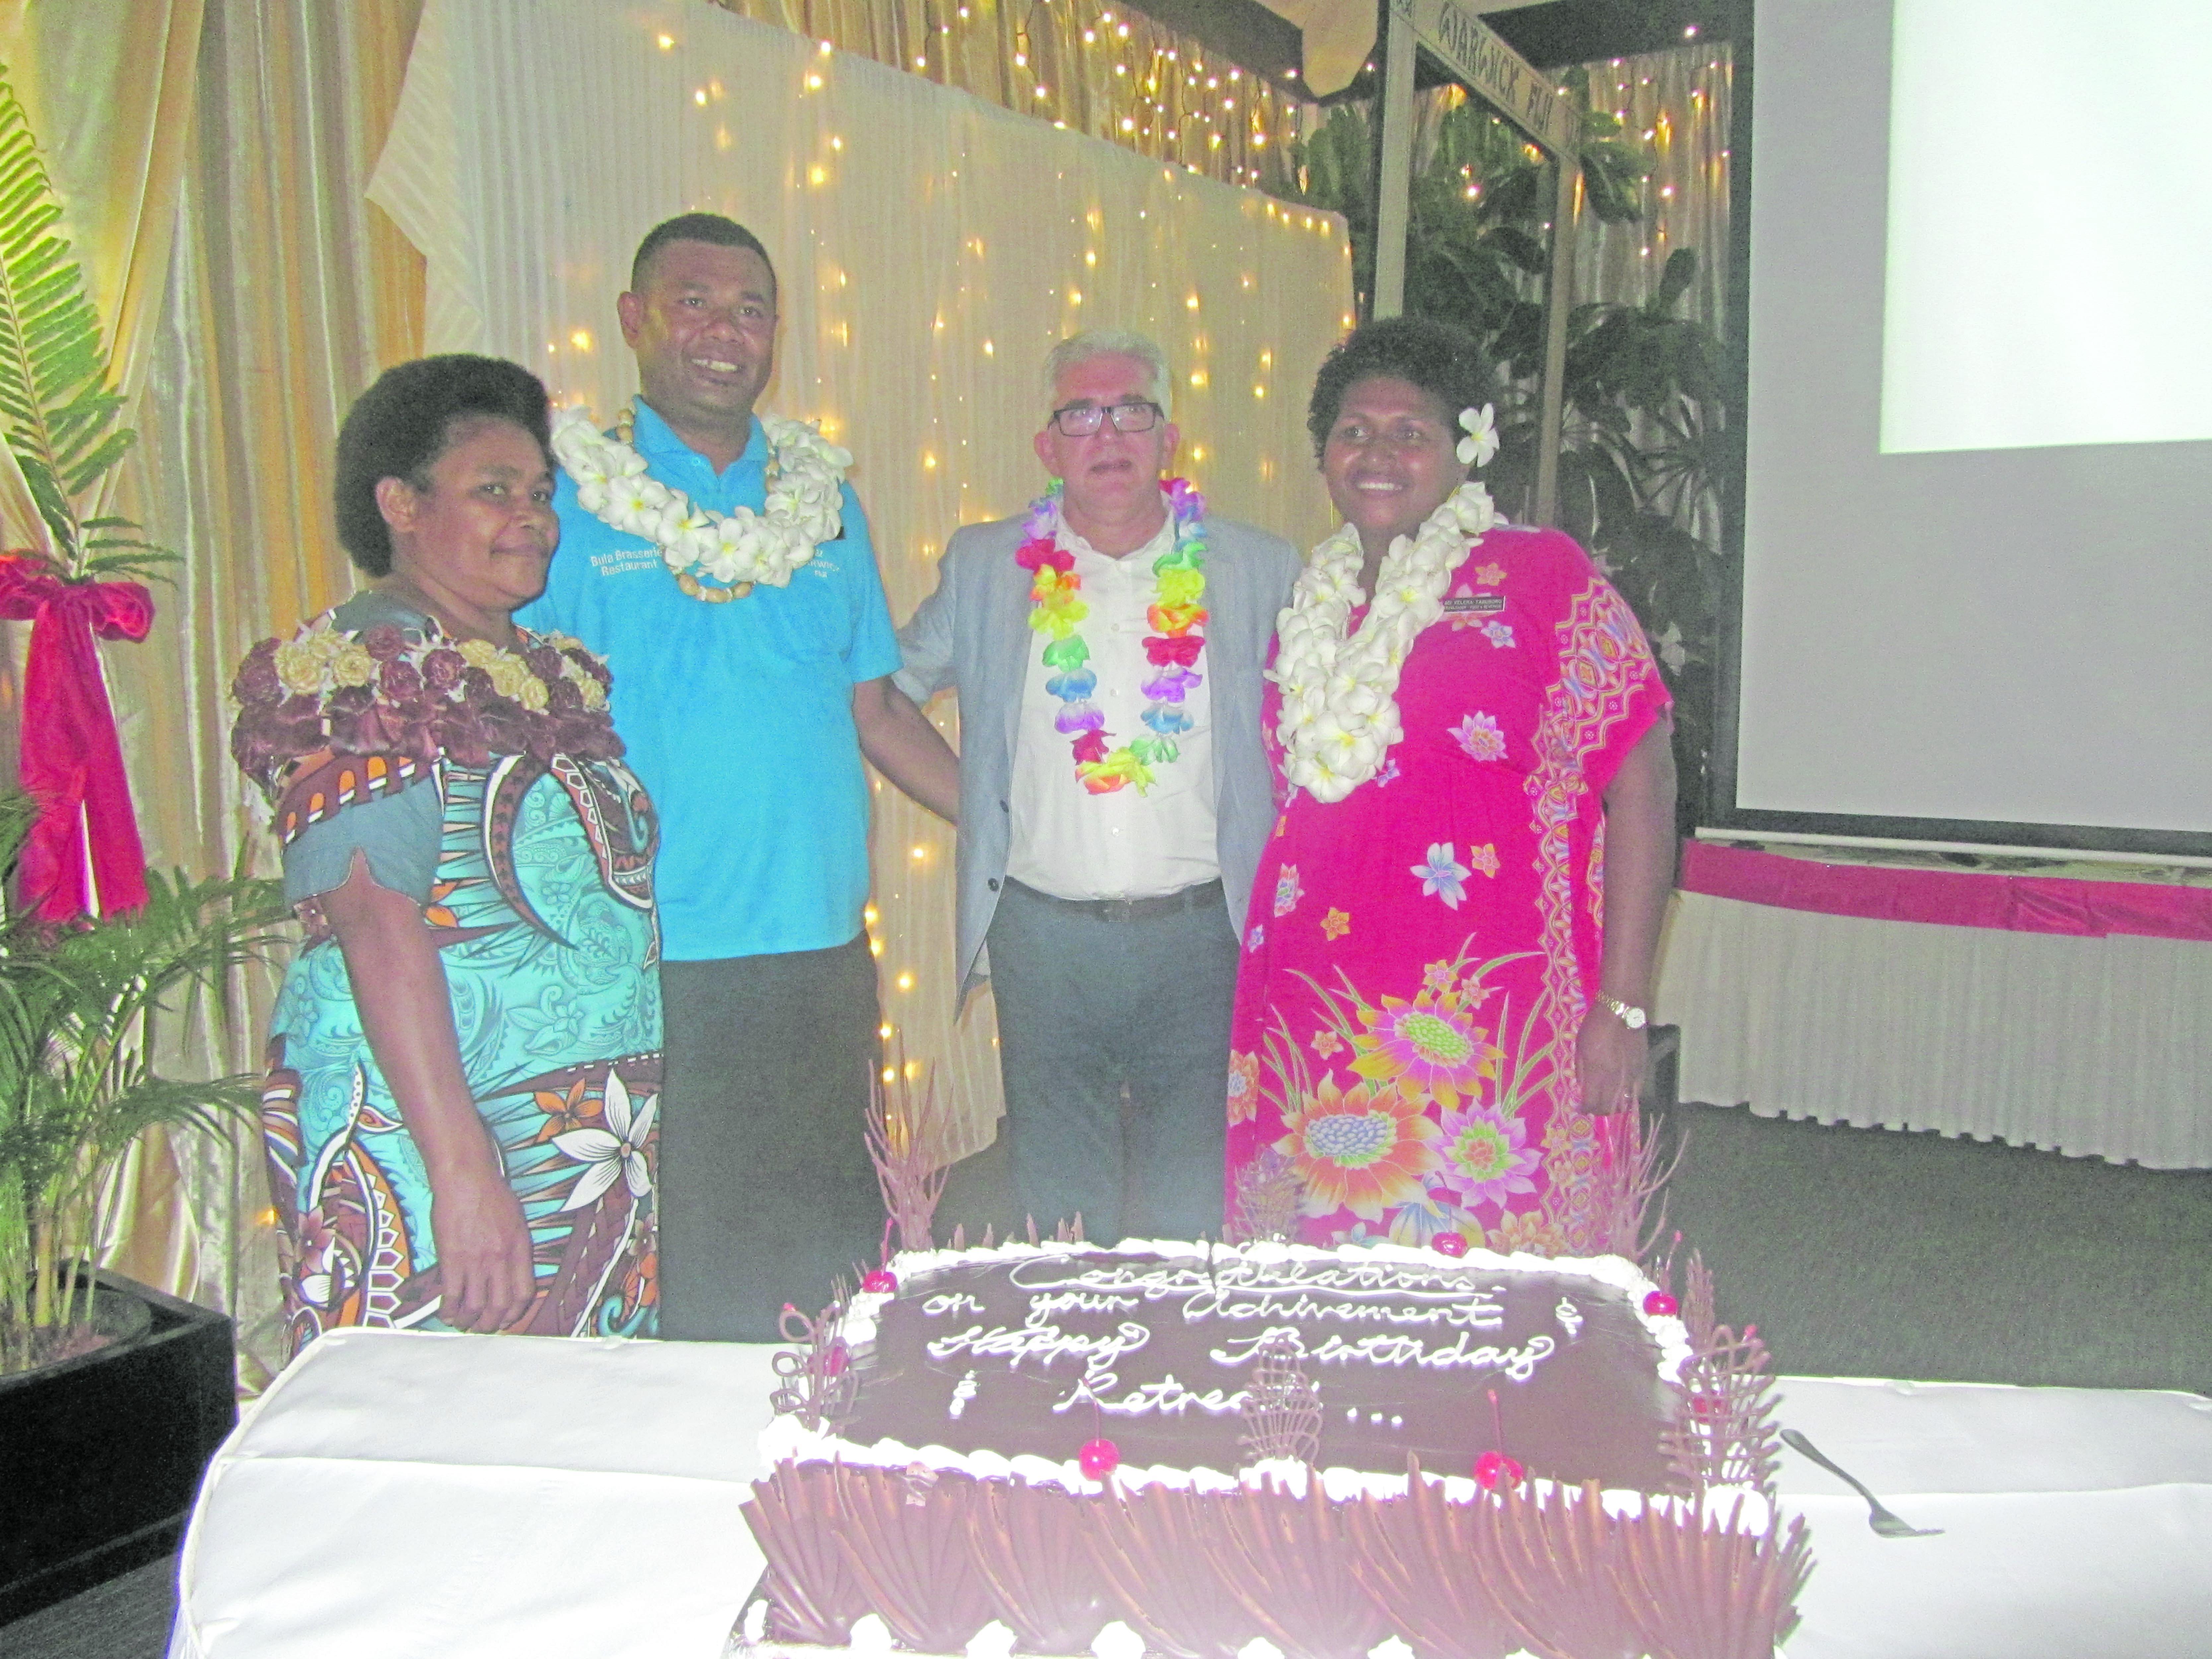 Warwick Fiji award winners Adi Tea Simo, Amenisitai Lewaqamuqamu and Adi Kelera Tabusoro. with general manager Charles Homsy (third from left).  Photo: Warwick Fiji